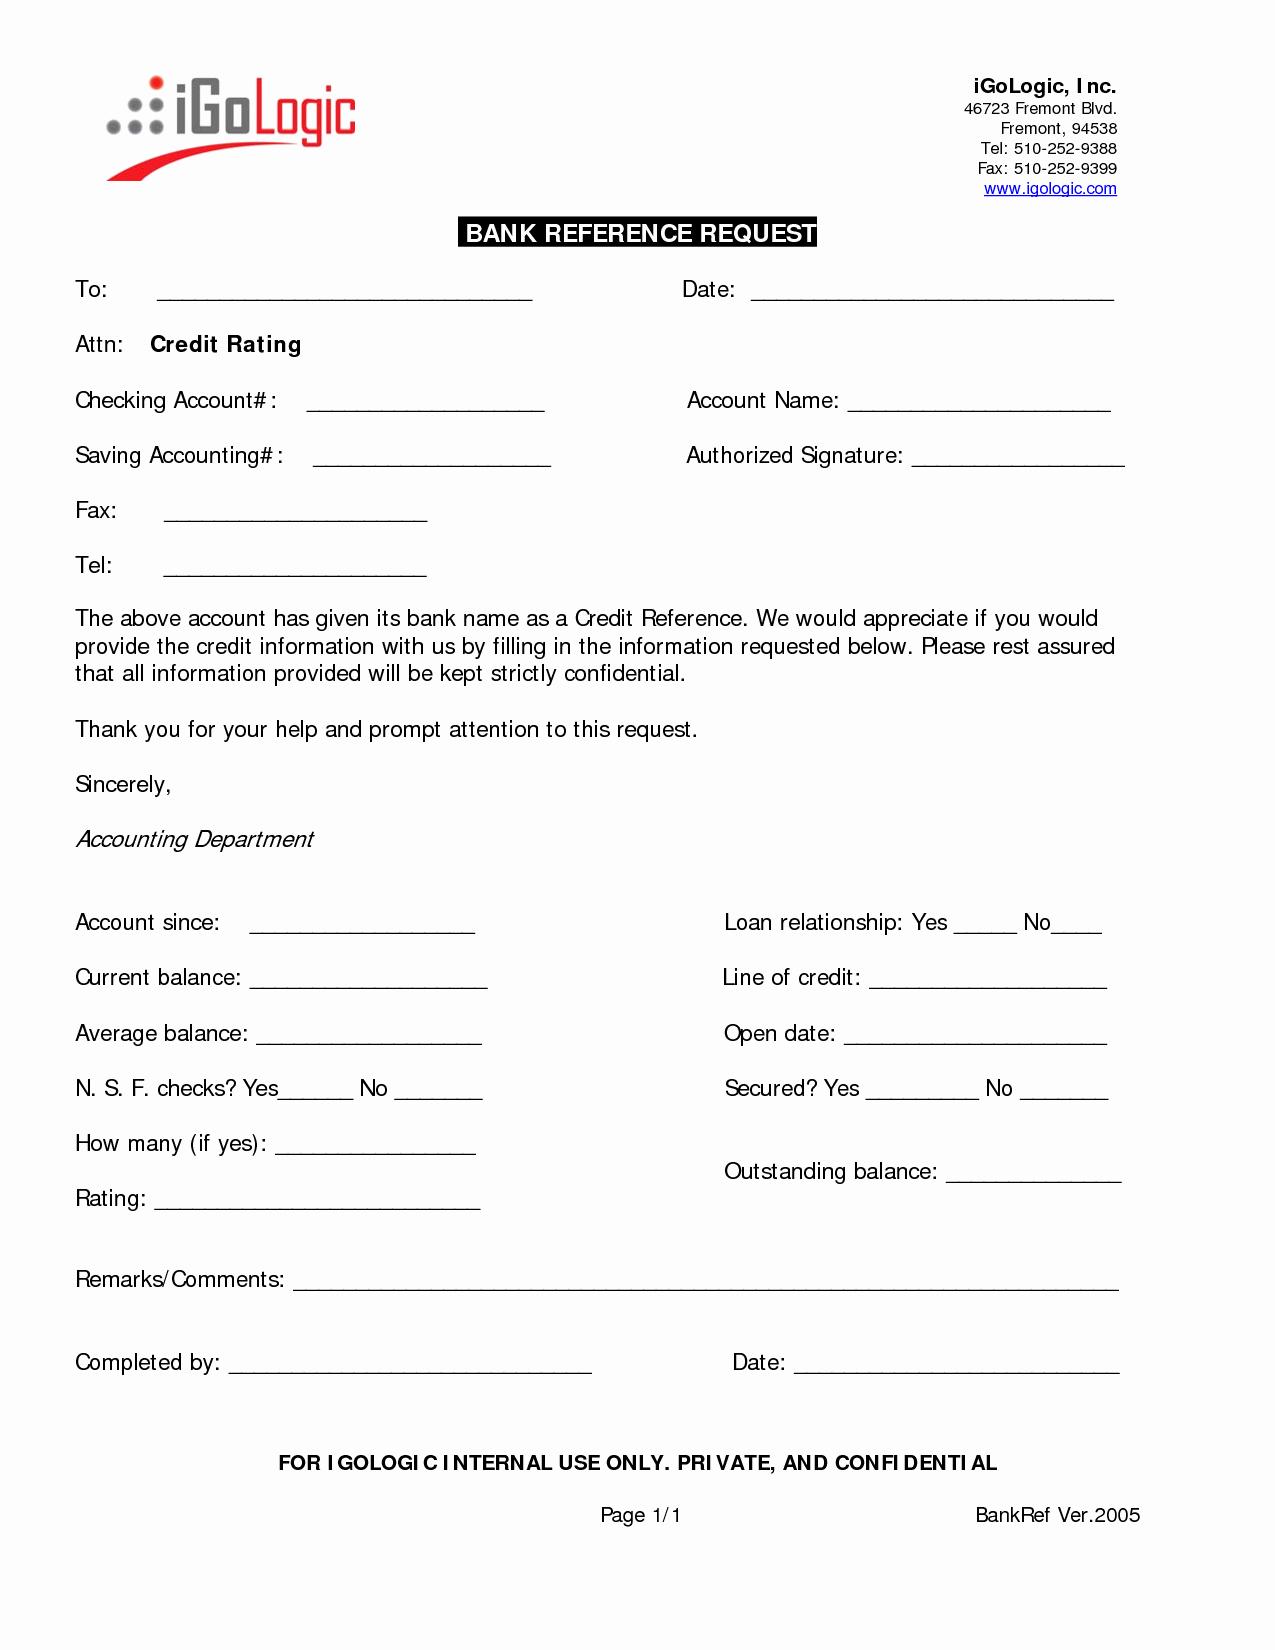 Credit Reference Sheet Template Elegant Business Credit Reference Template Free Printable Documents